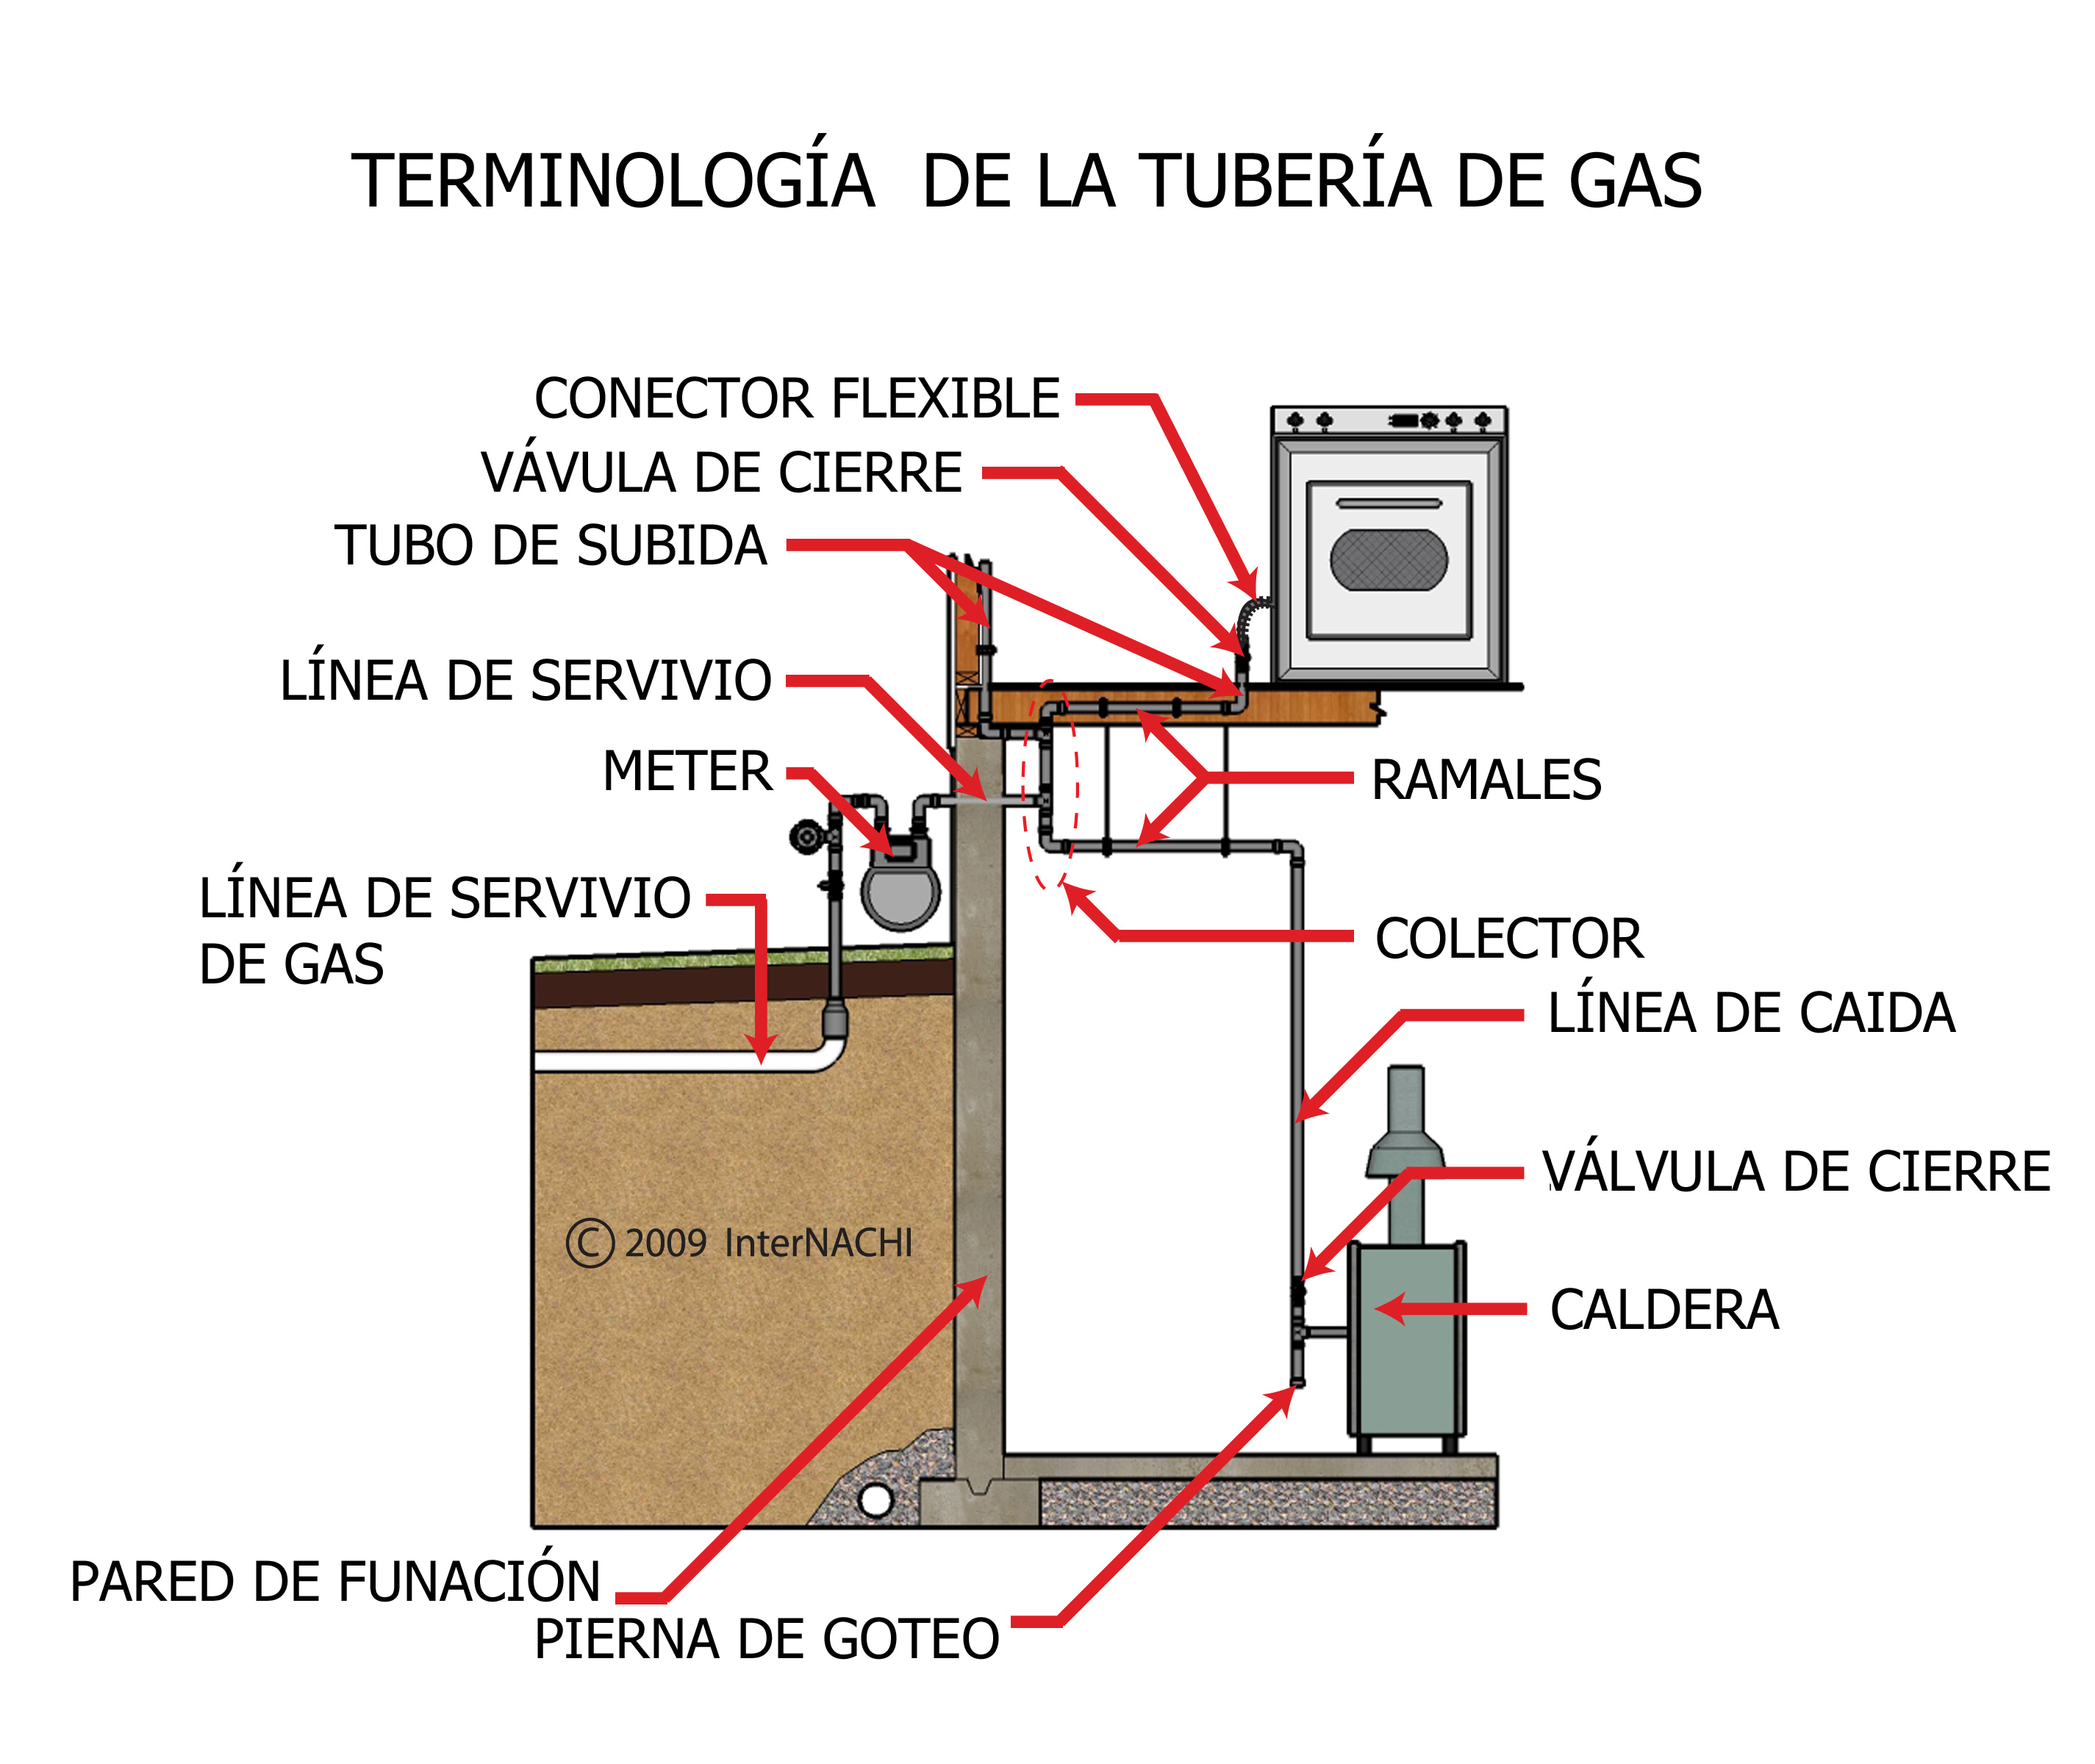 Gas piping terminology - Spanish.